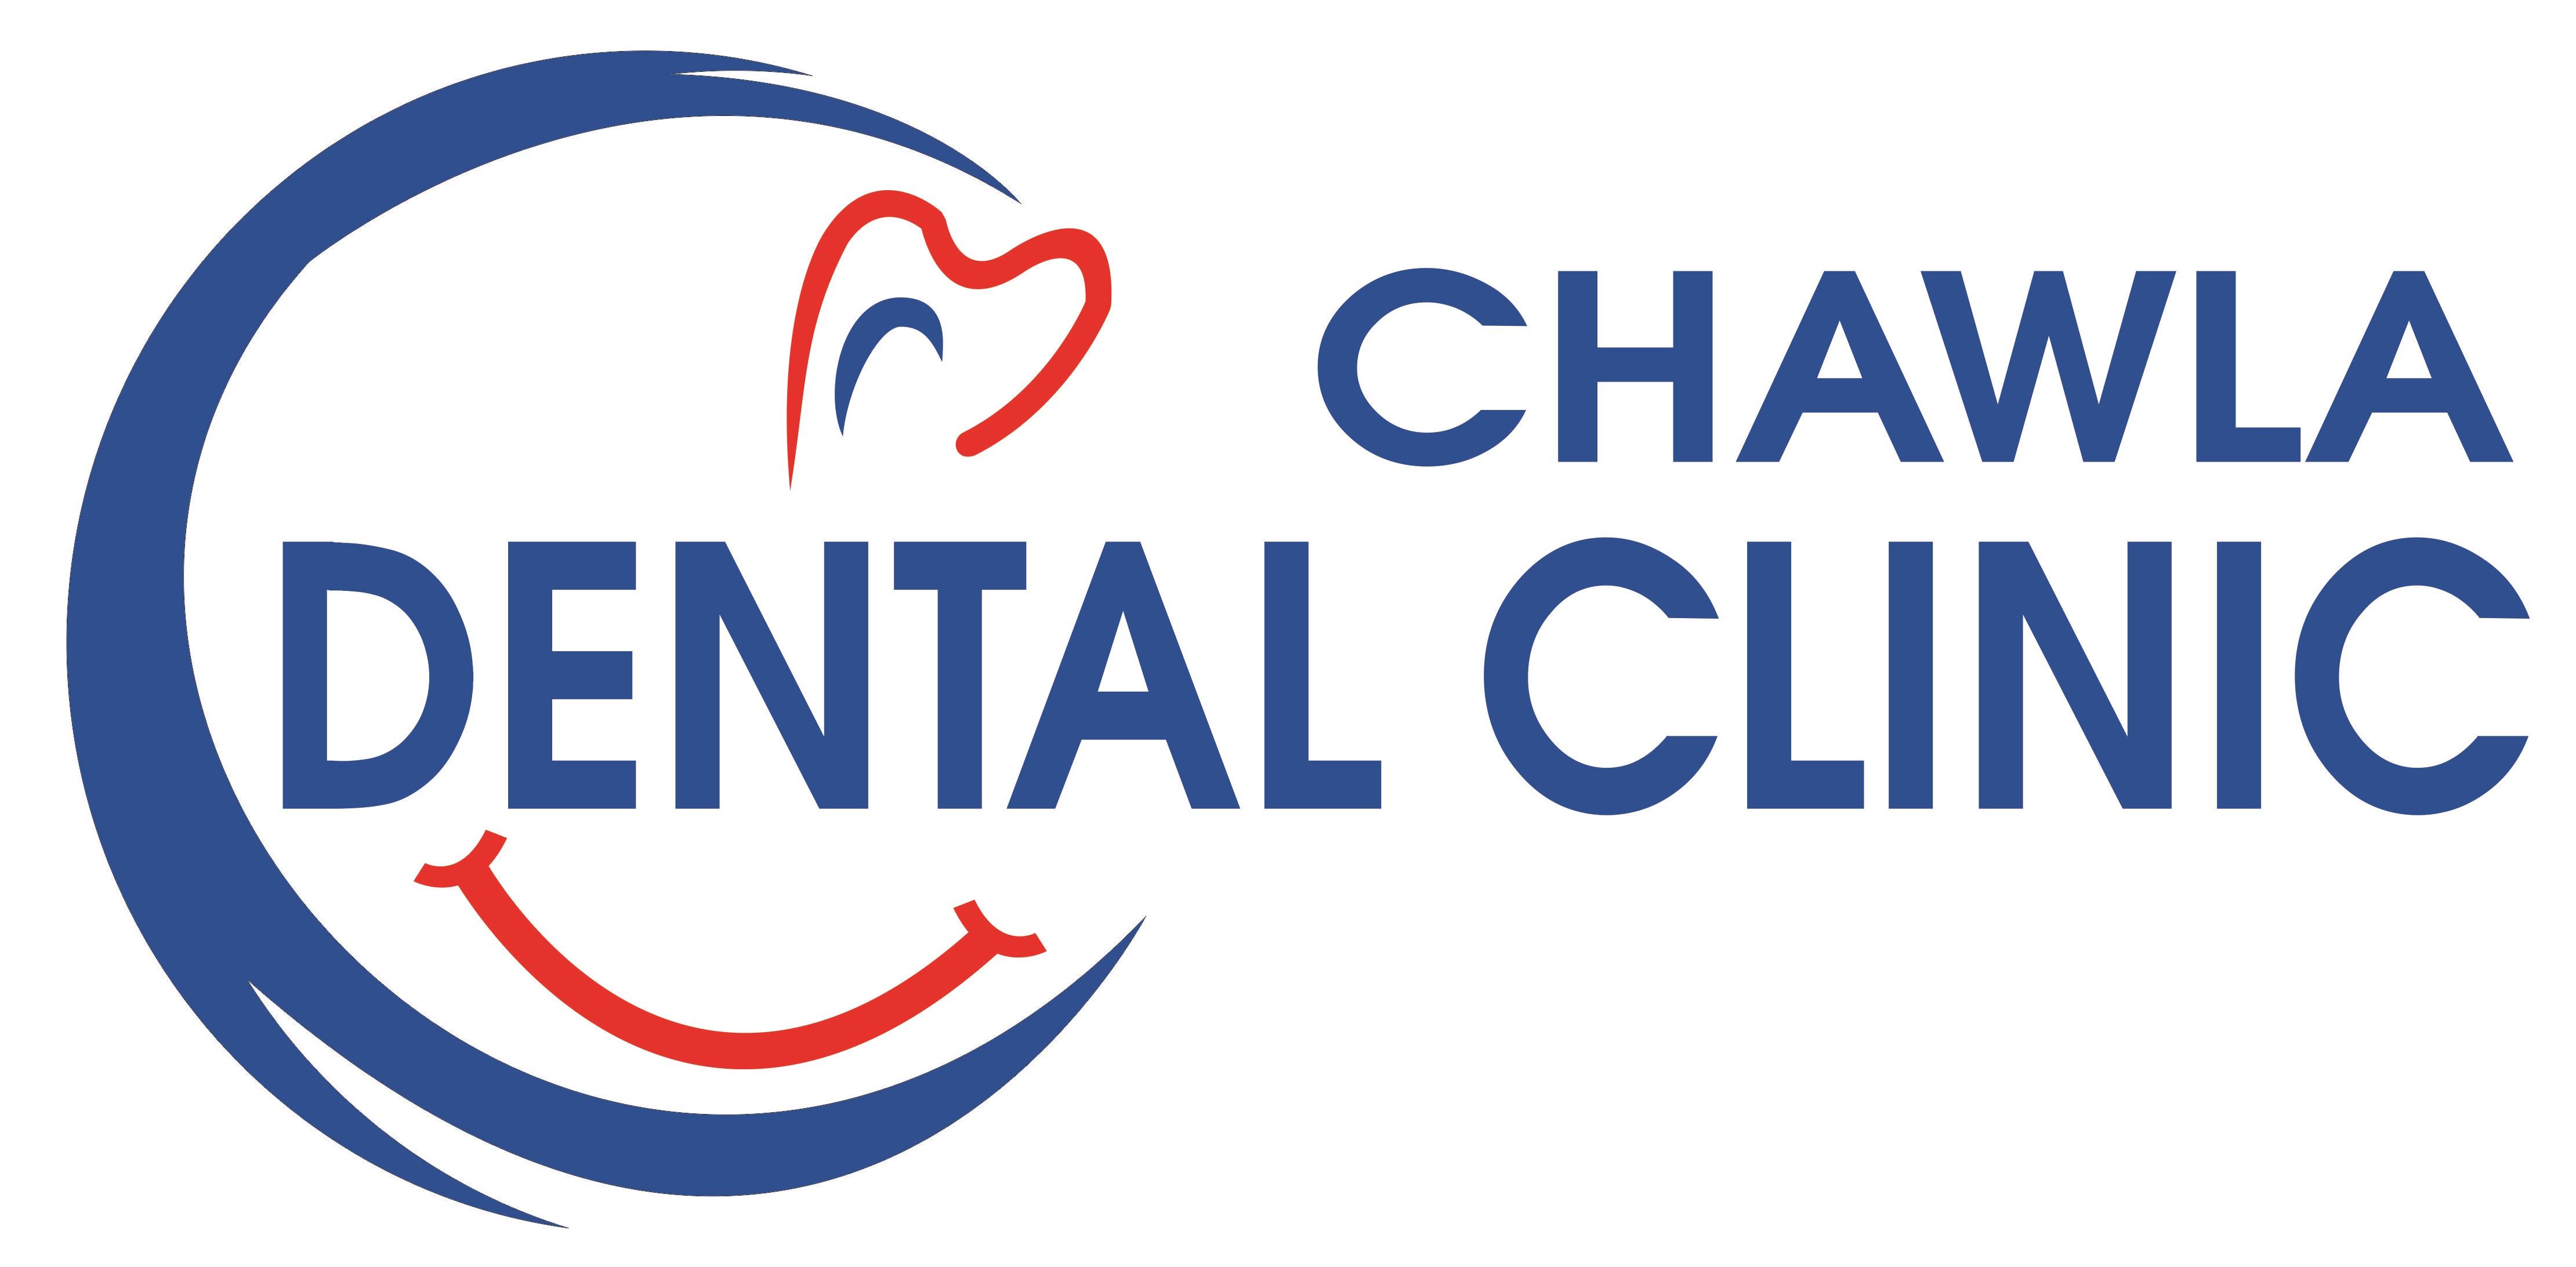 Chawla Dental Clinic & Surgical Center